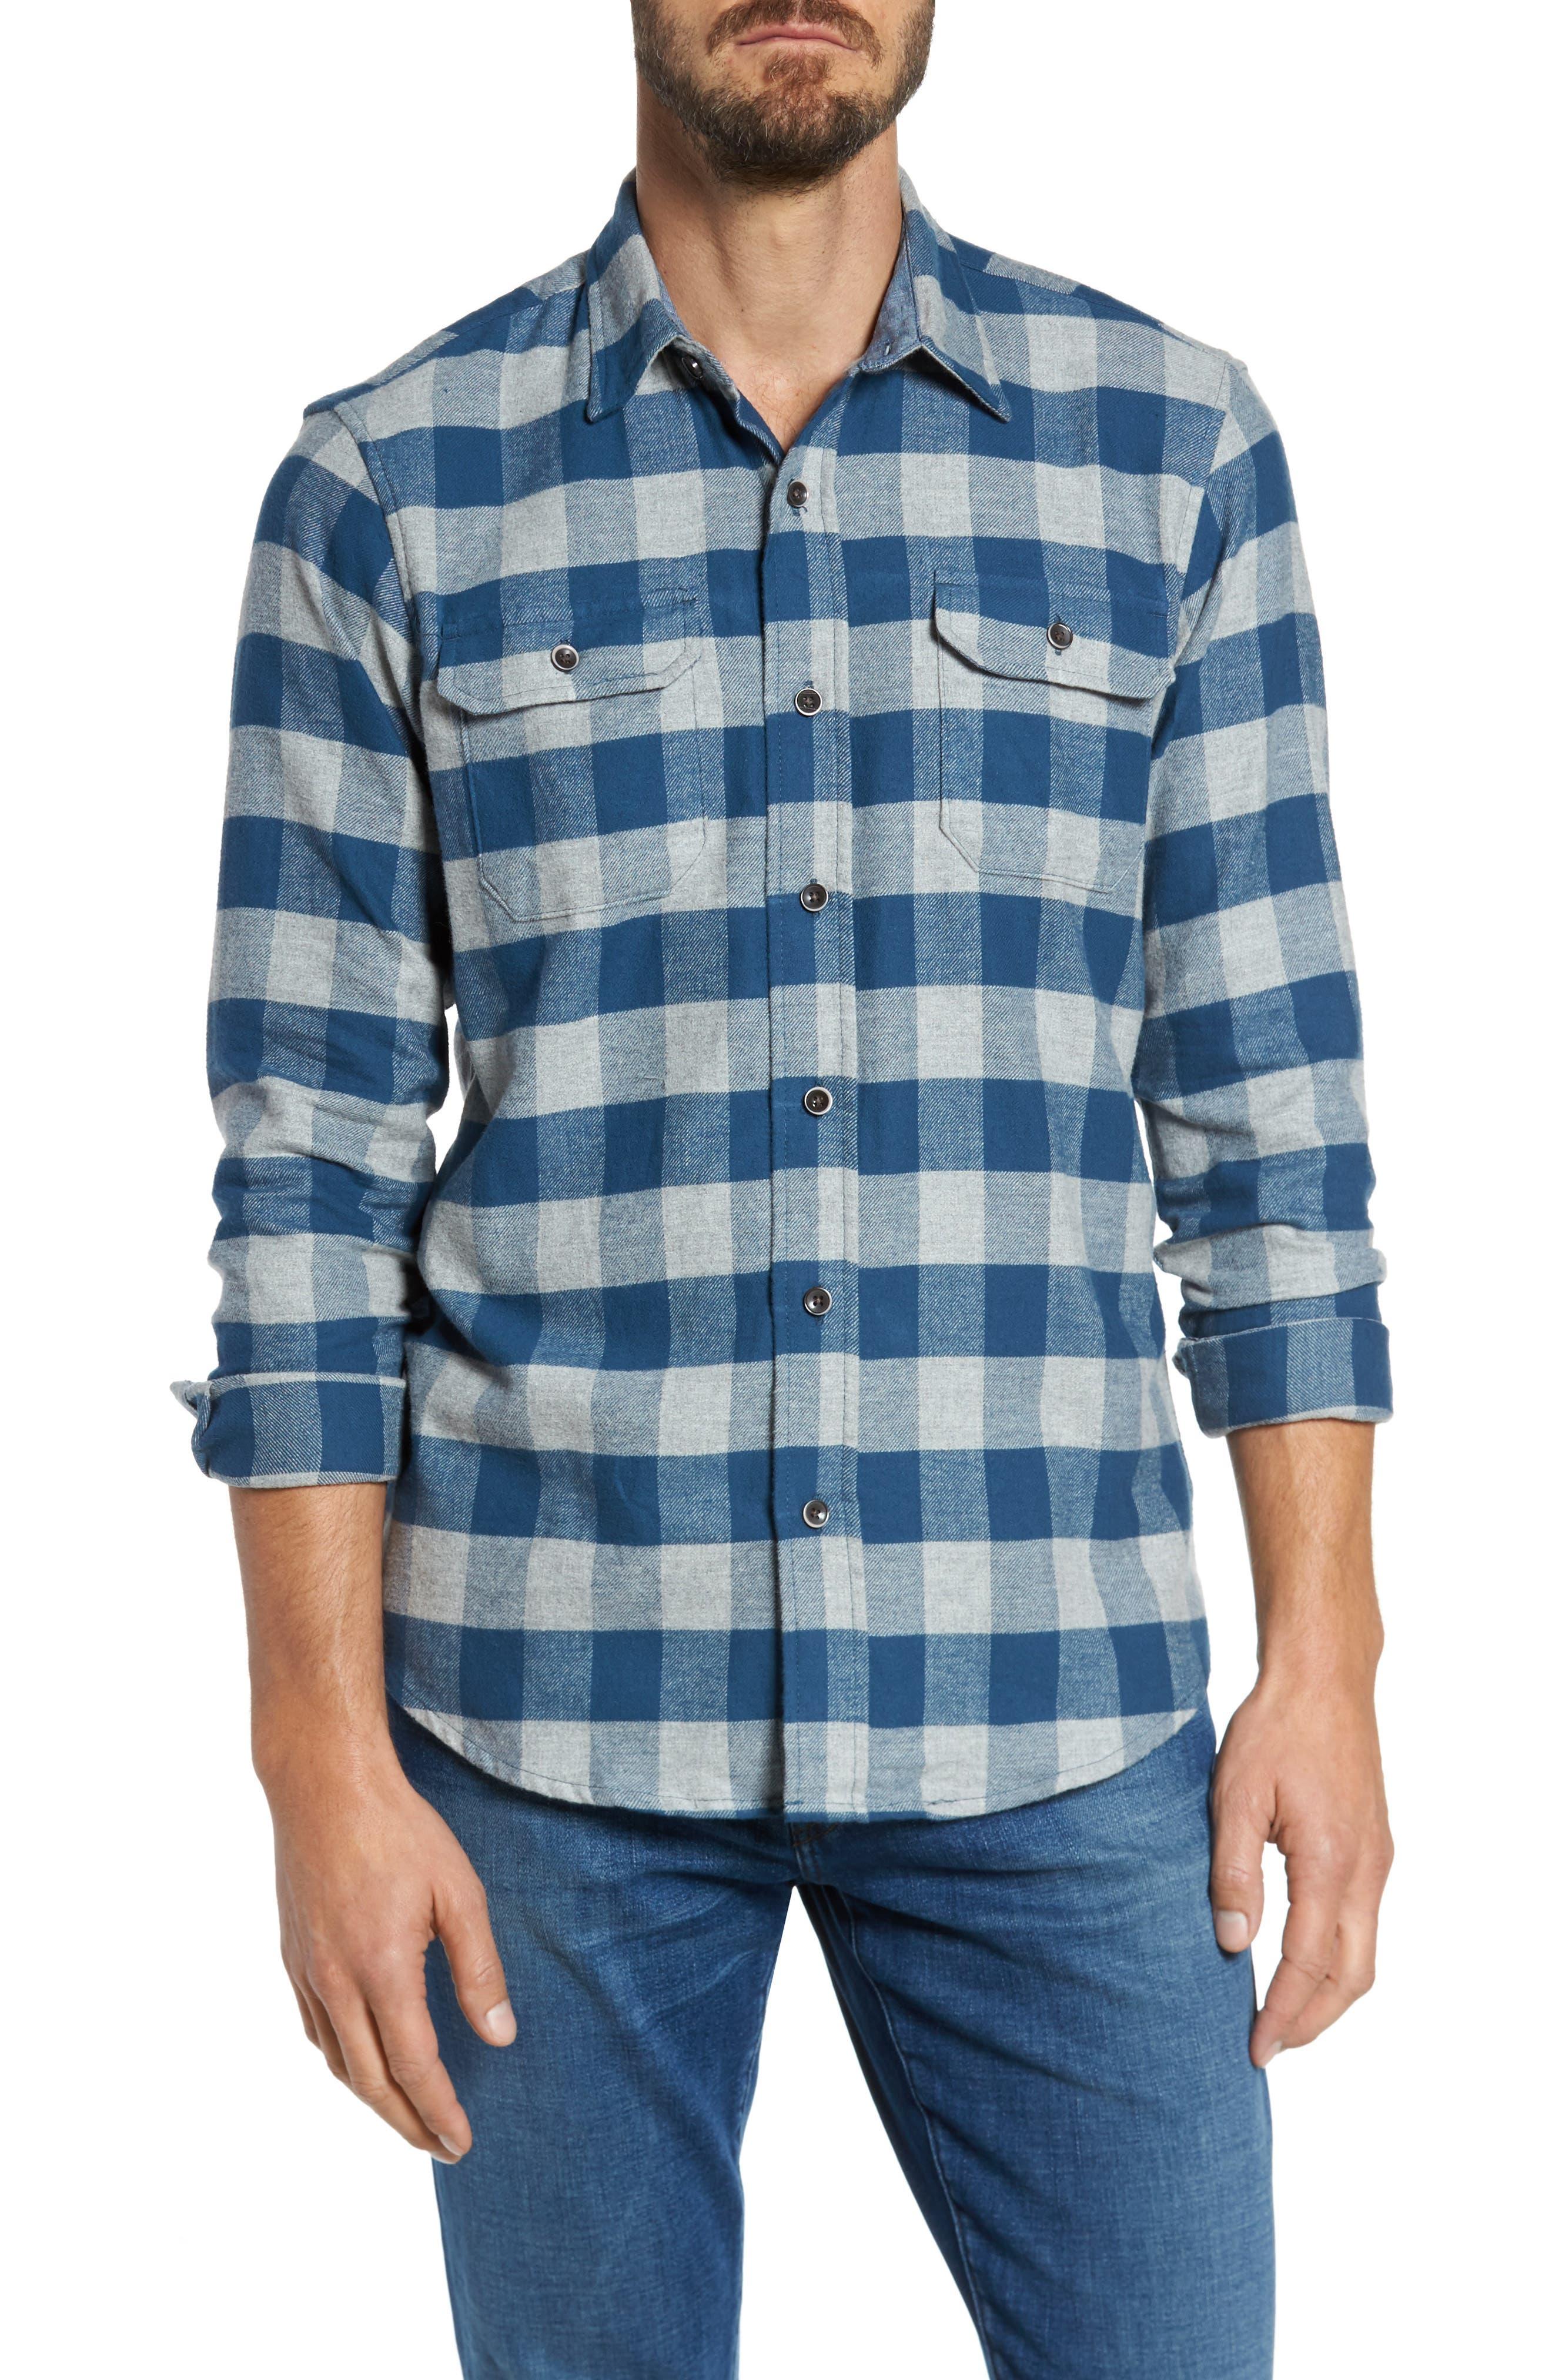 Buffalo Check Flannel Shirt,                             Main thumbnail 1, color,                             Teal/ Med Grey Heather